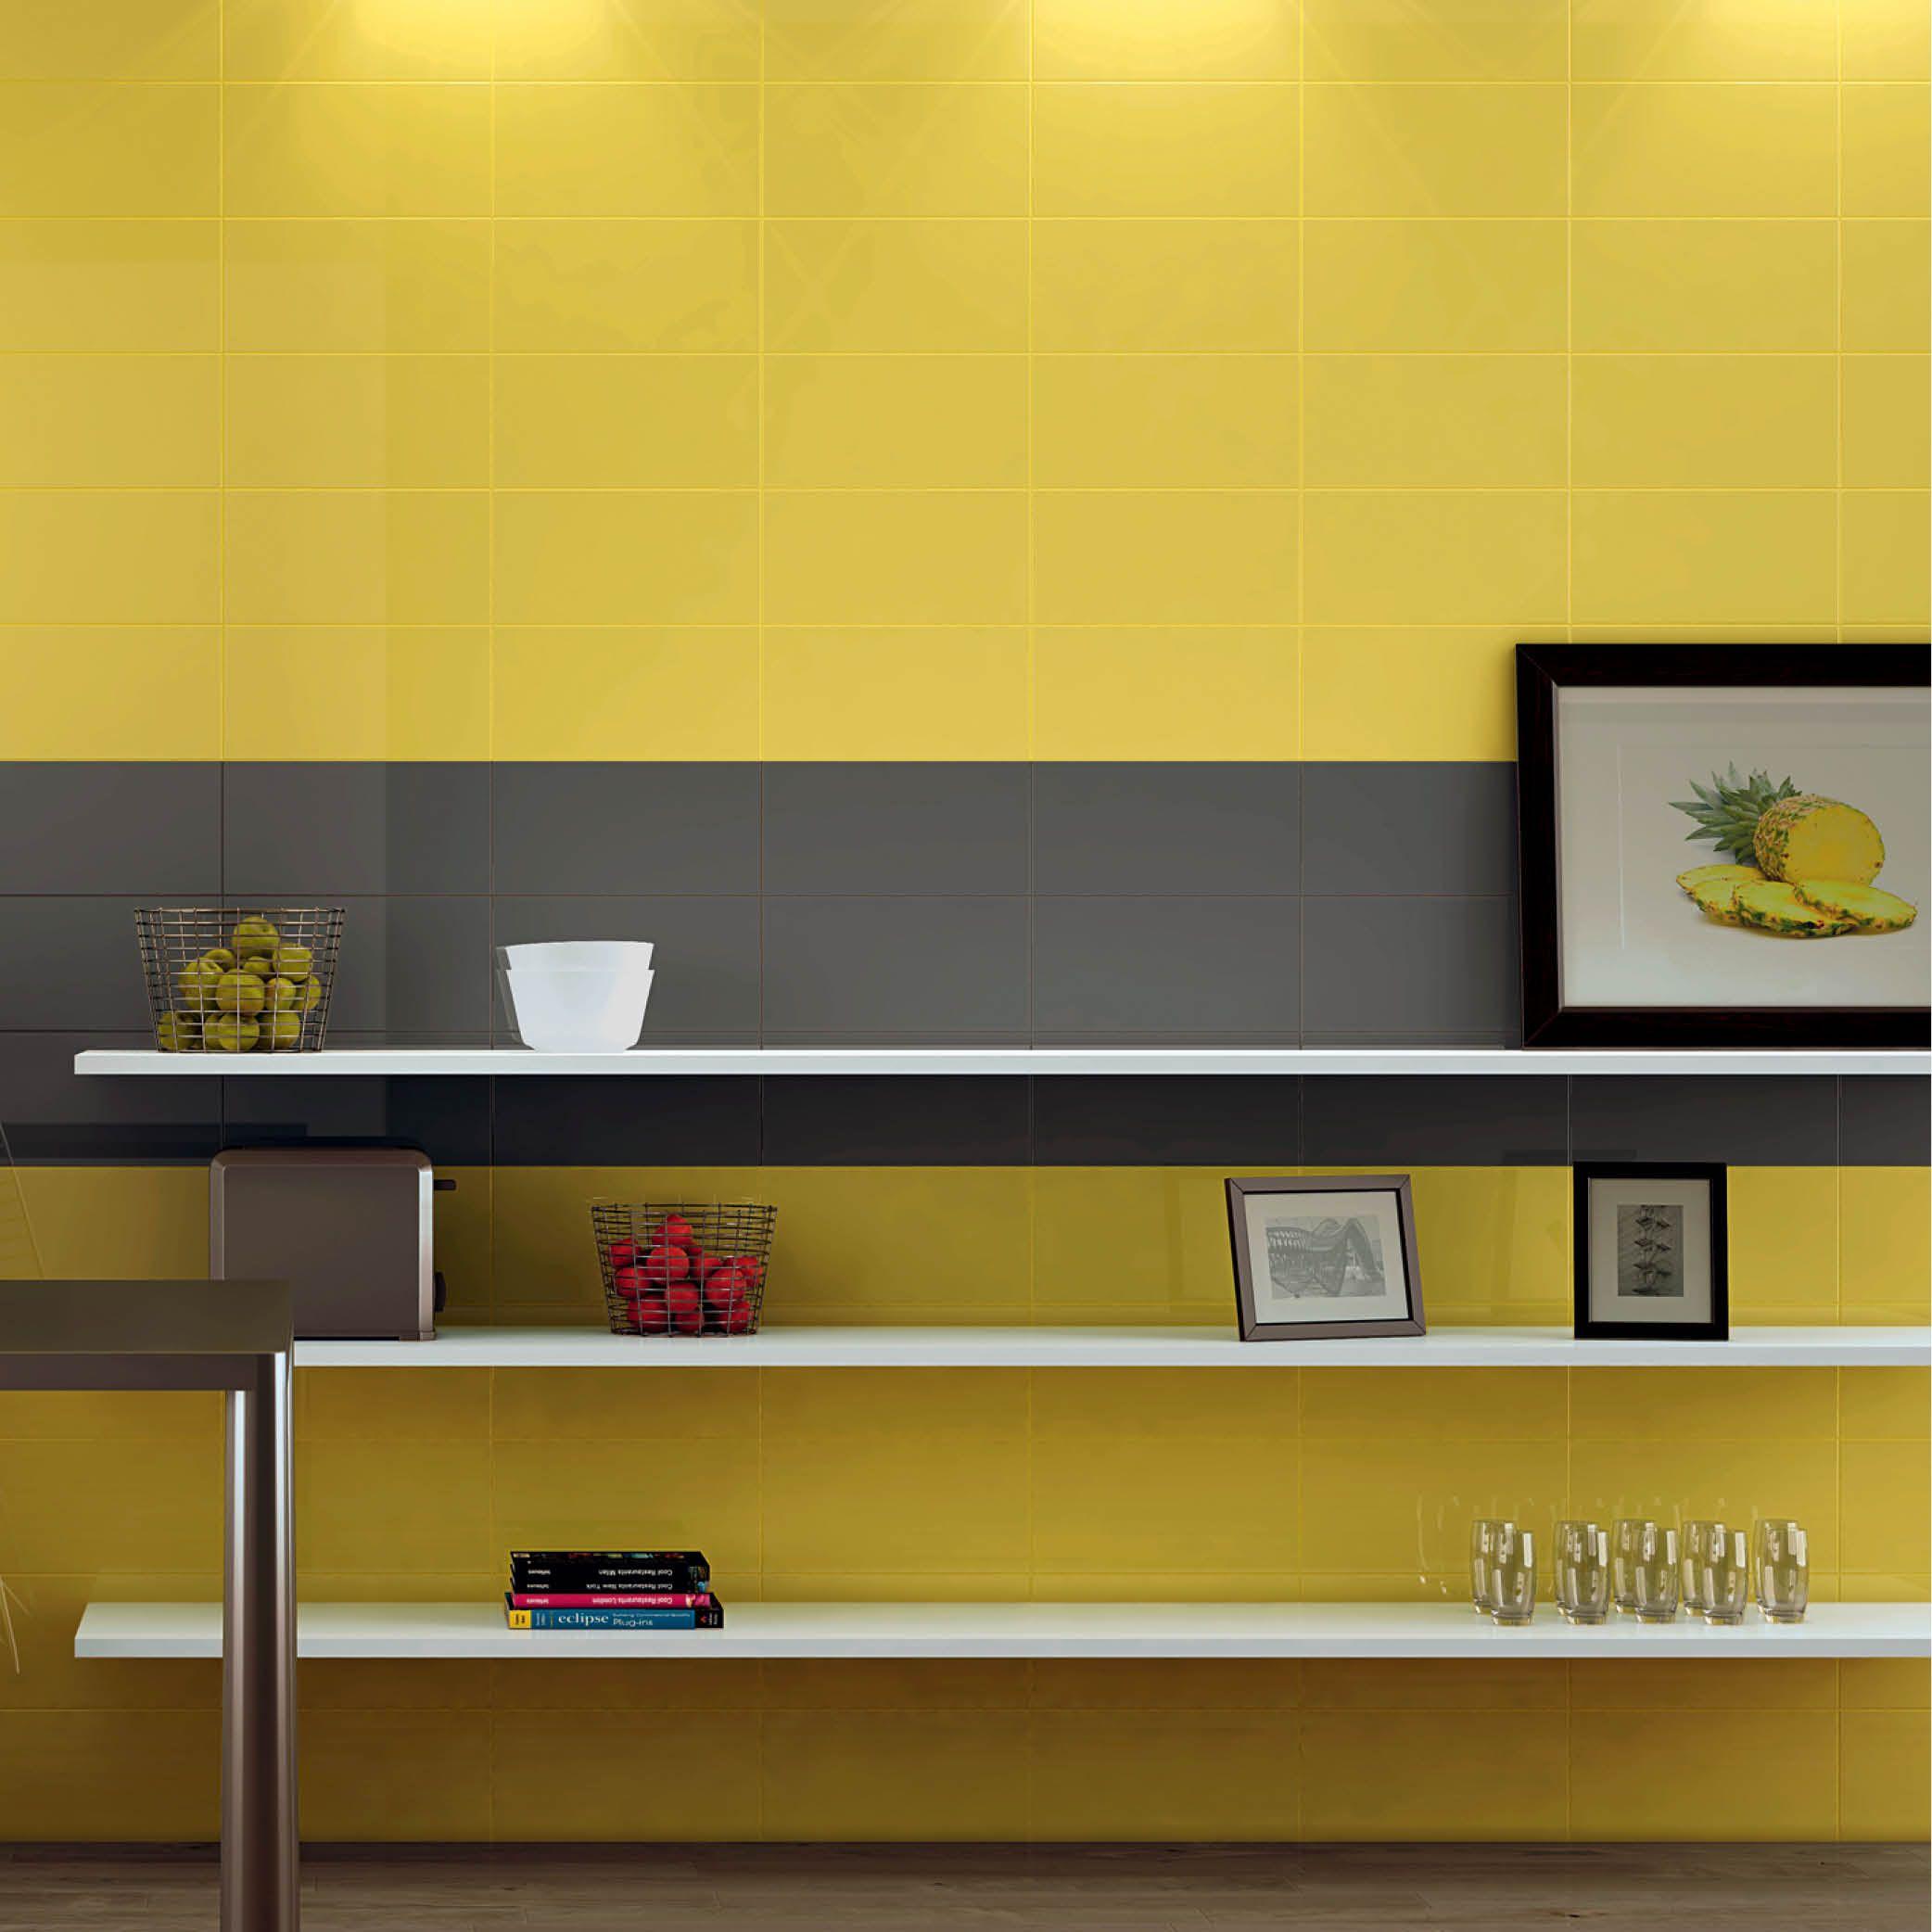 Uncategorized Colour Tiles For Kitchen mustard yellow colour palette tiles httpwww ctdtiles co ukc kitchen for floor and walls